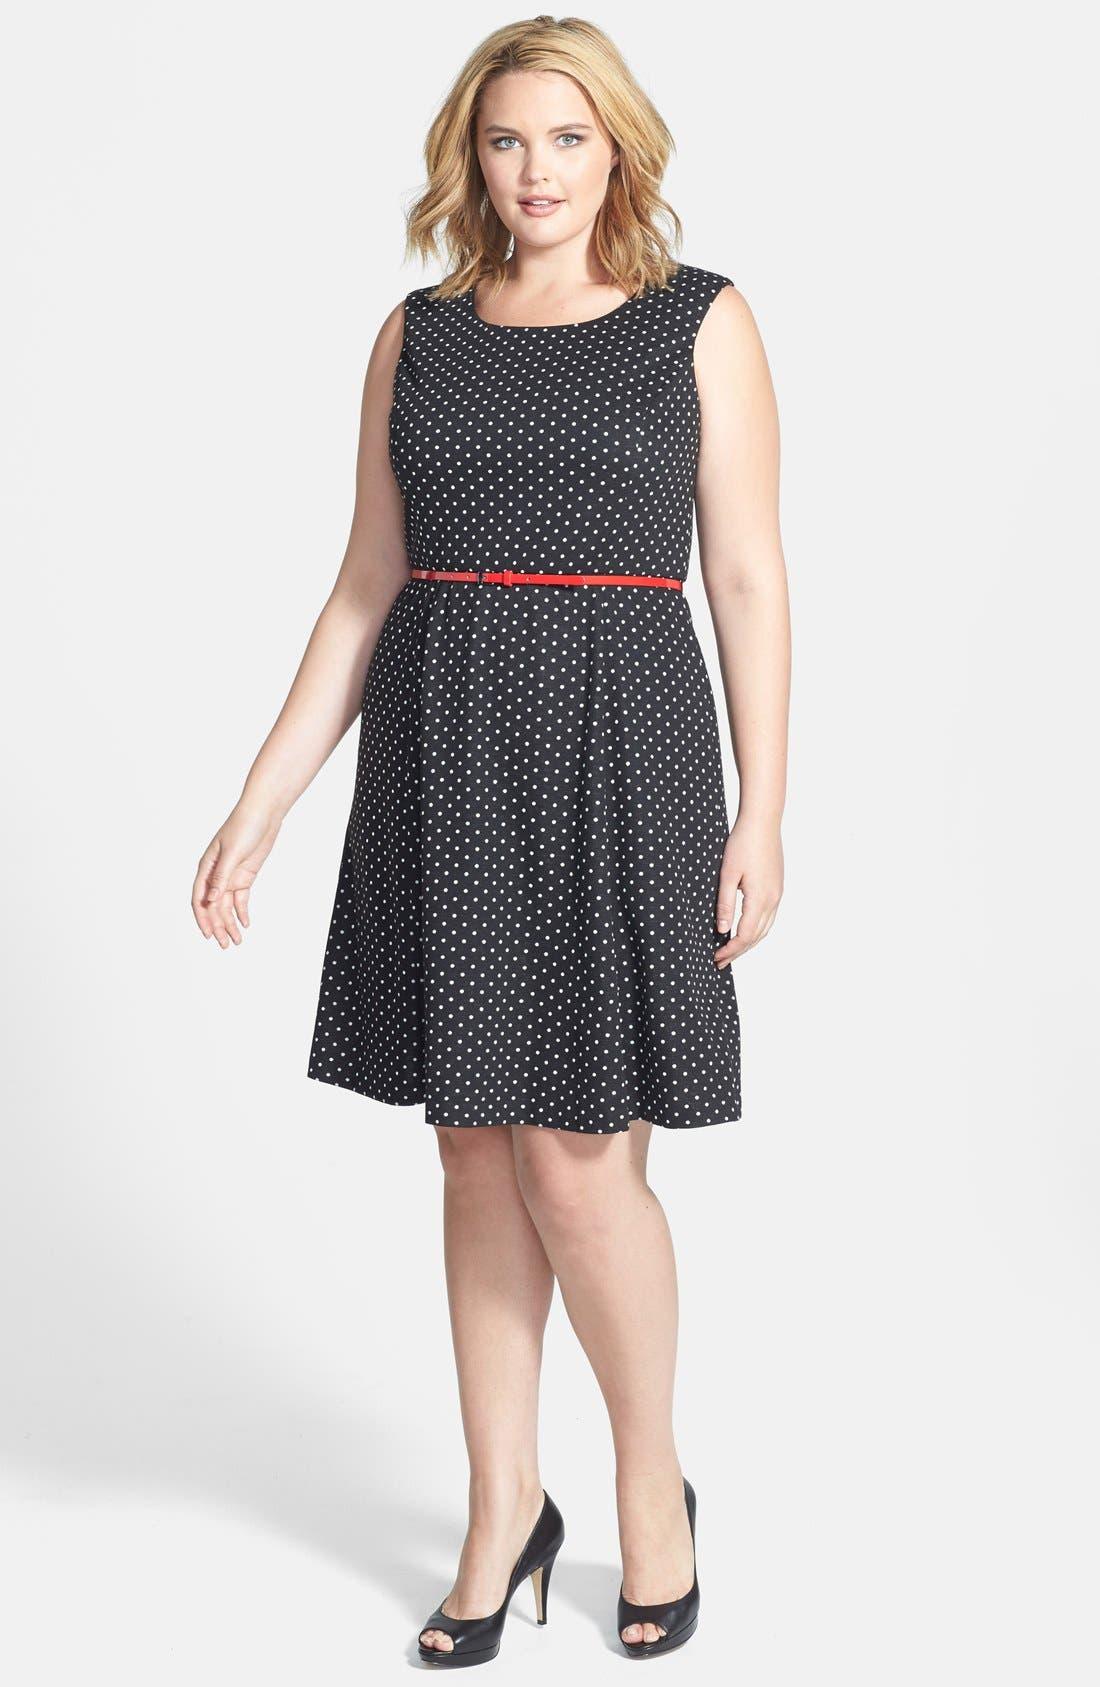 Alternate Image 1 Selected - Anne Klein Belted Polka Dot Ponte Dress (Plus Size)